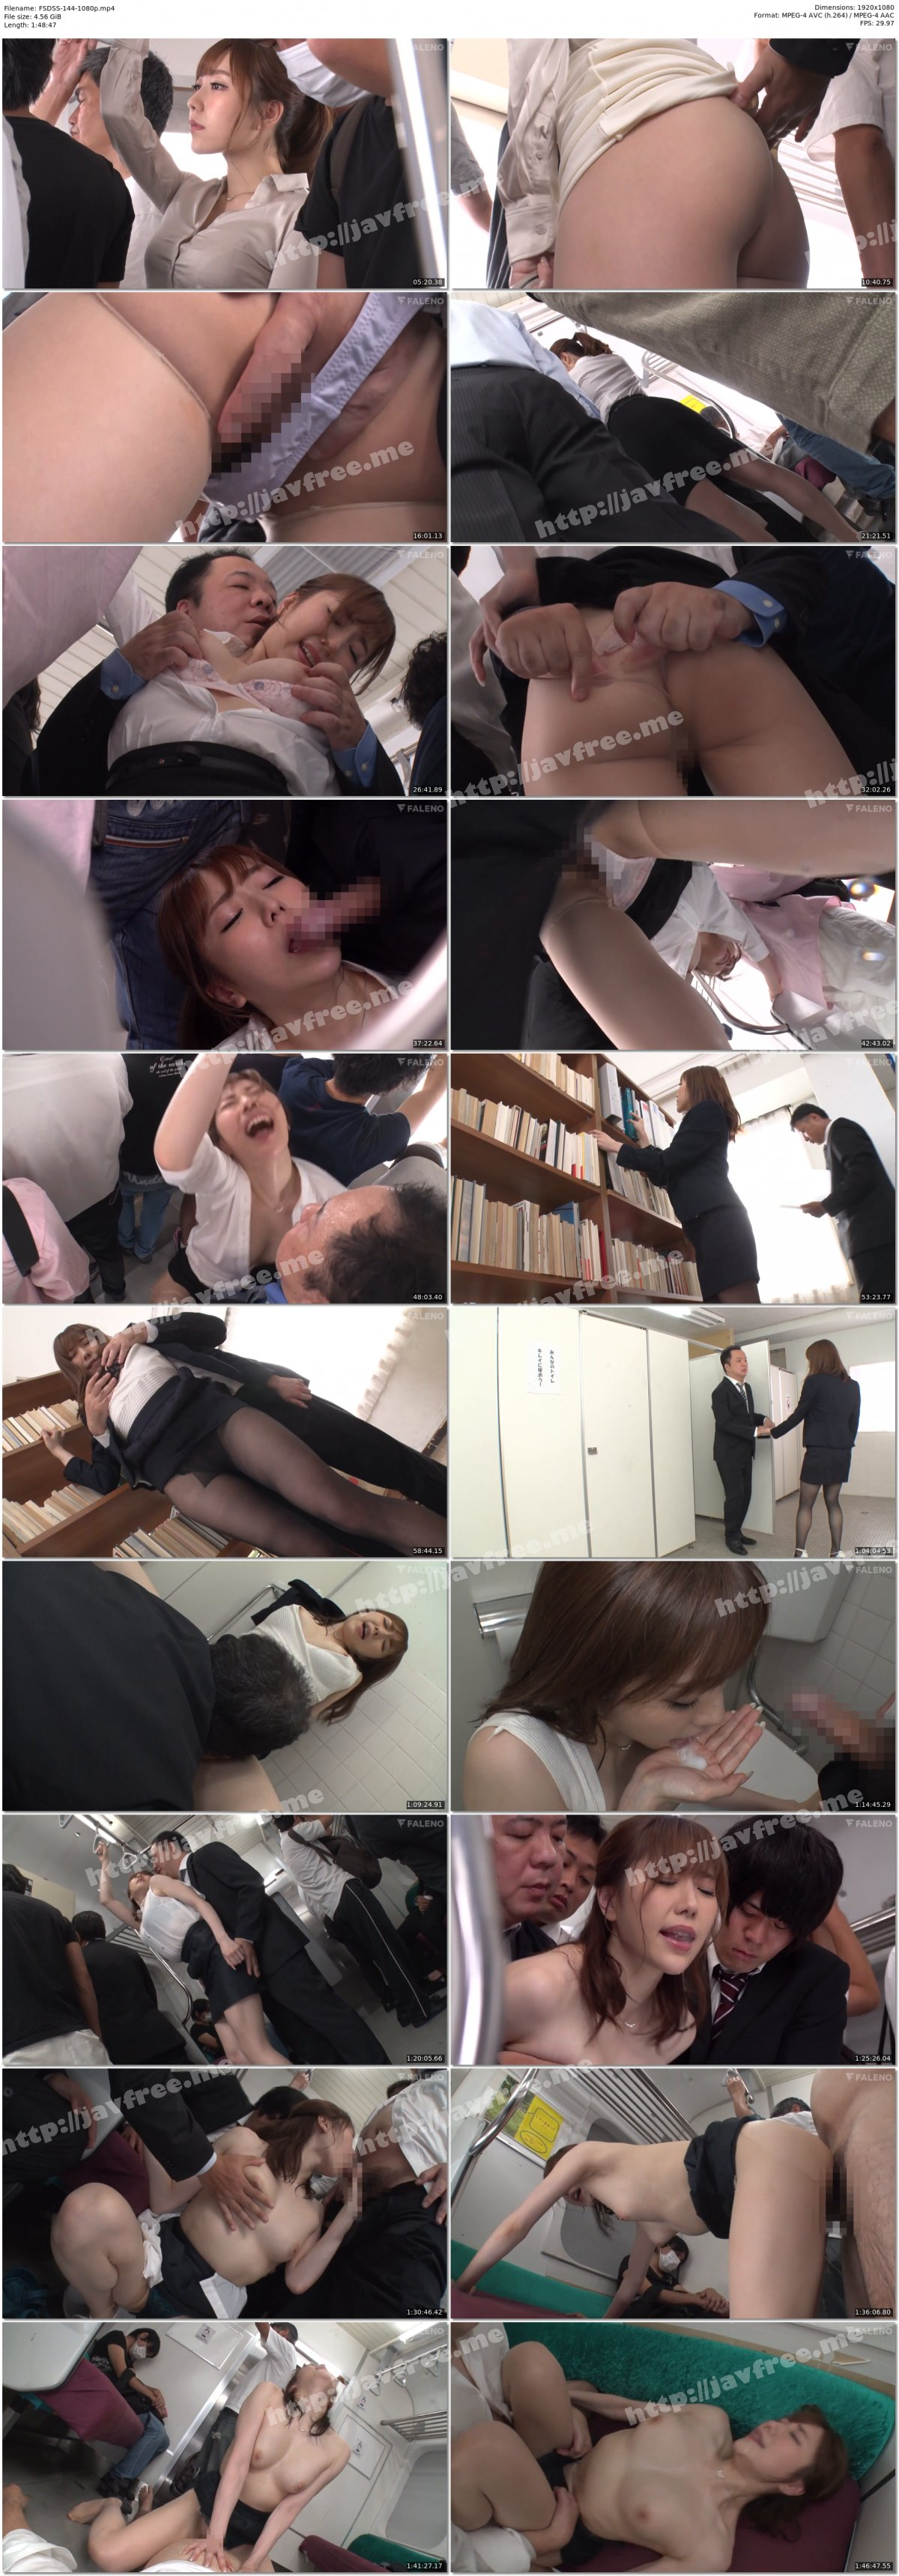 [HD][FSDSS-144] 痴姦の虜になったエリートOL 七海ティナ - image FSDSS-144-1080p on https://javfree.me